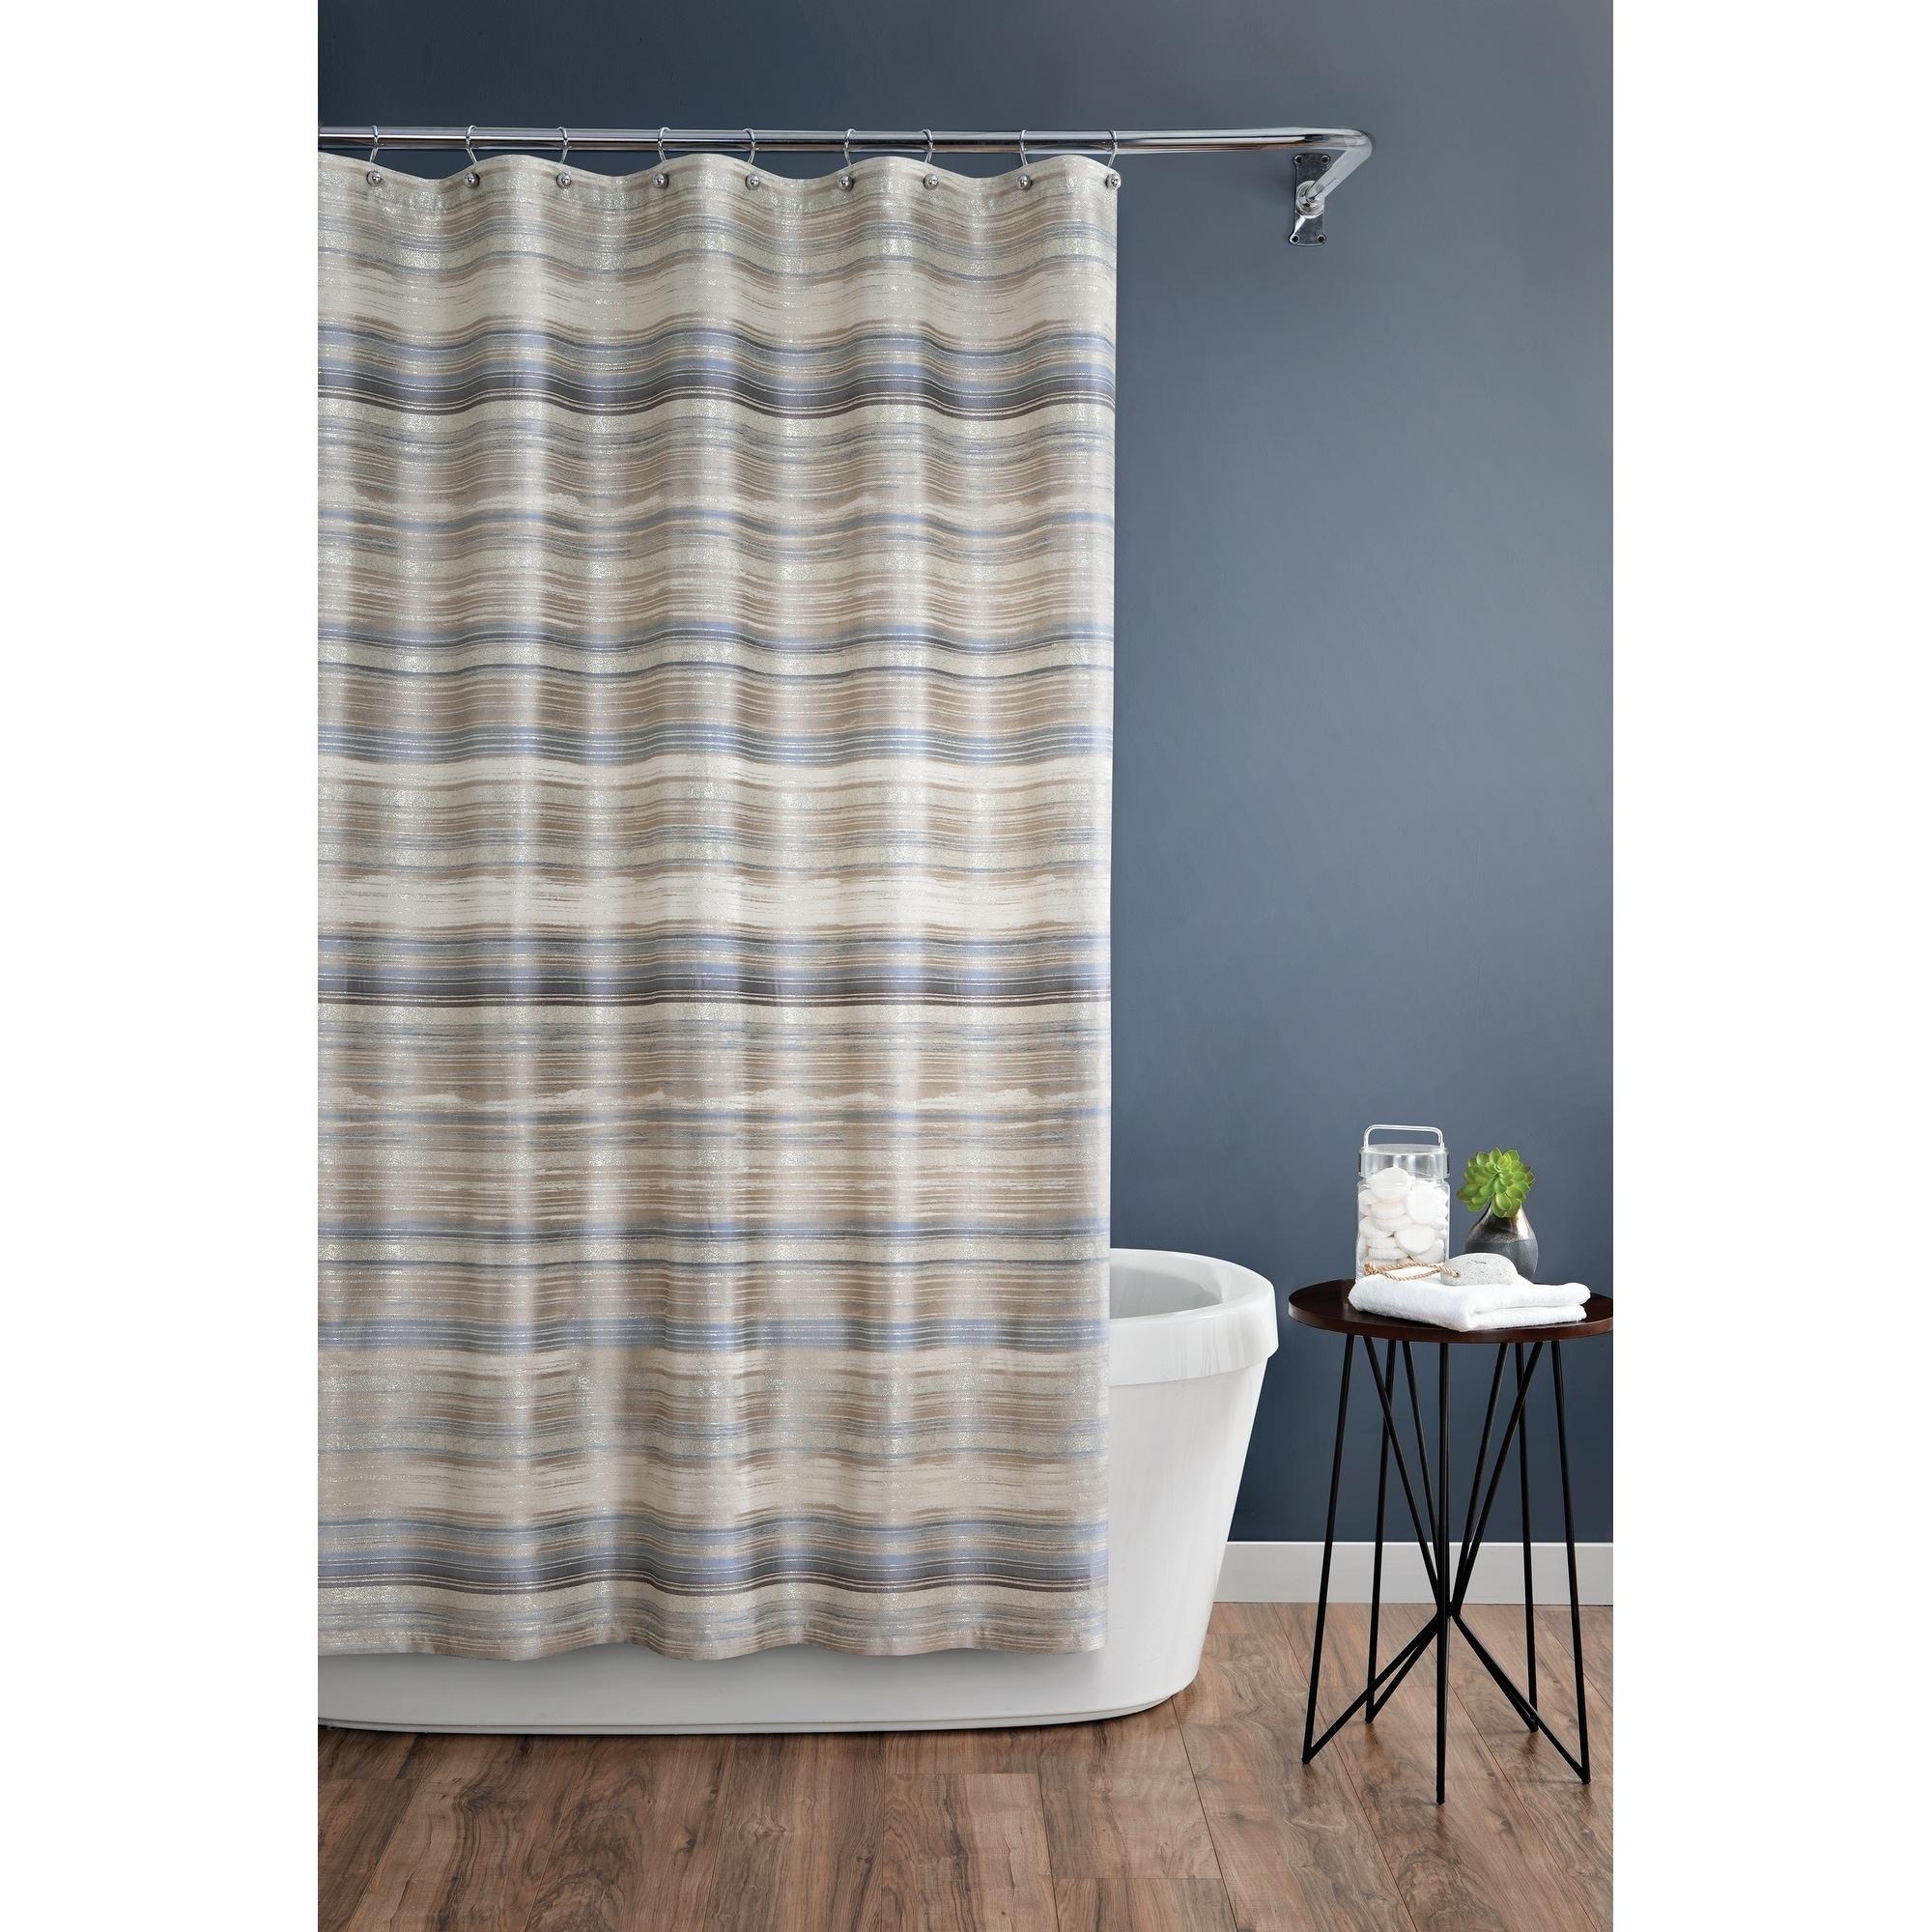 Croscill Darian Metallic And Blue Neutral Striped Shower Curtain